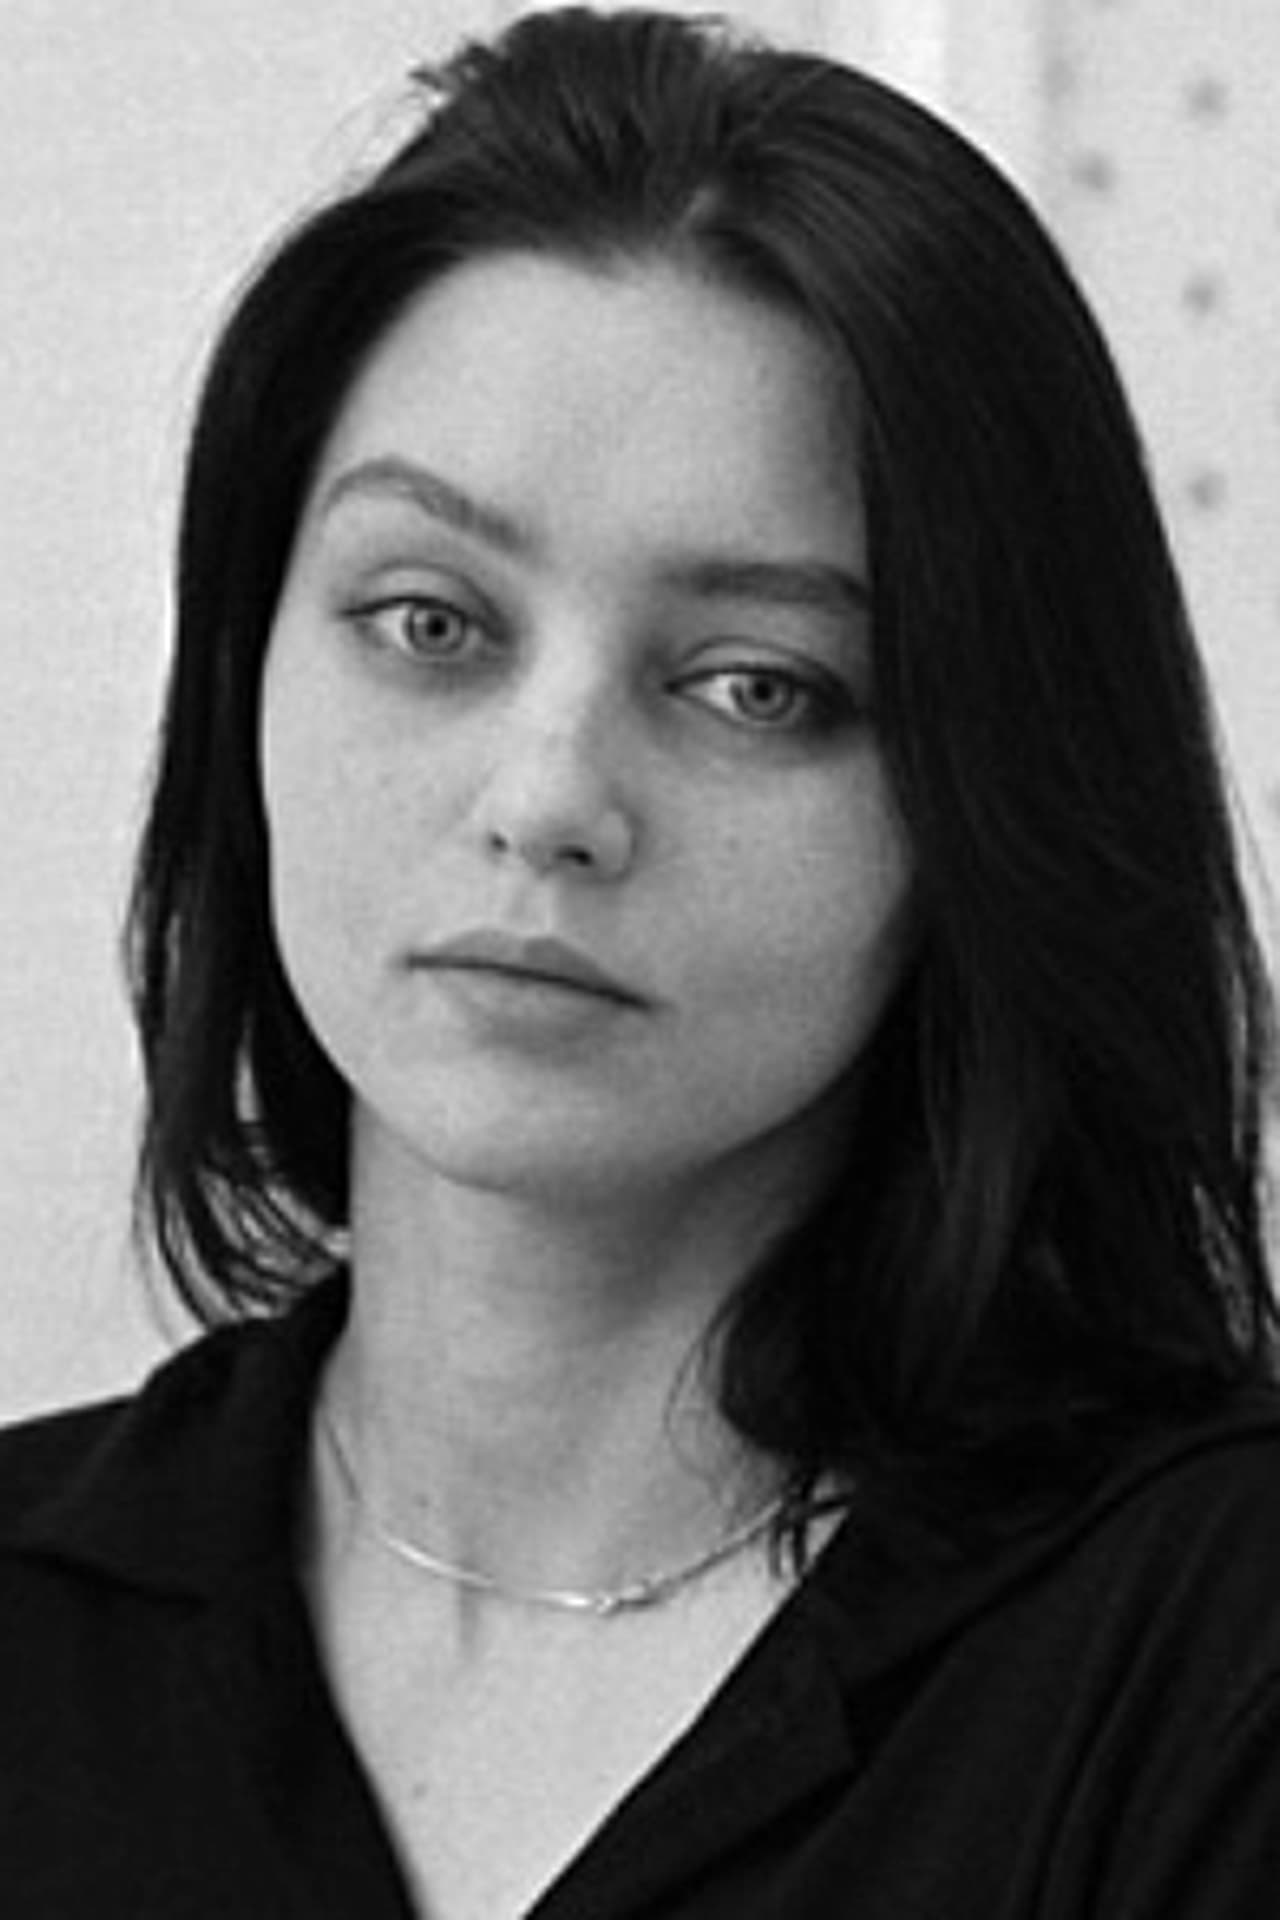 Nastya Golubeva Carax isLa petite fille